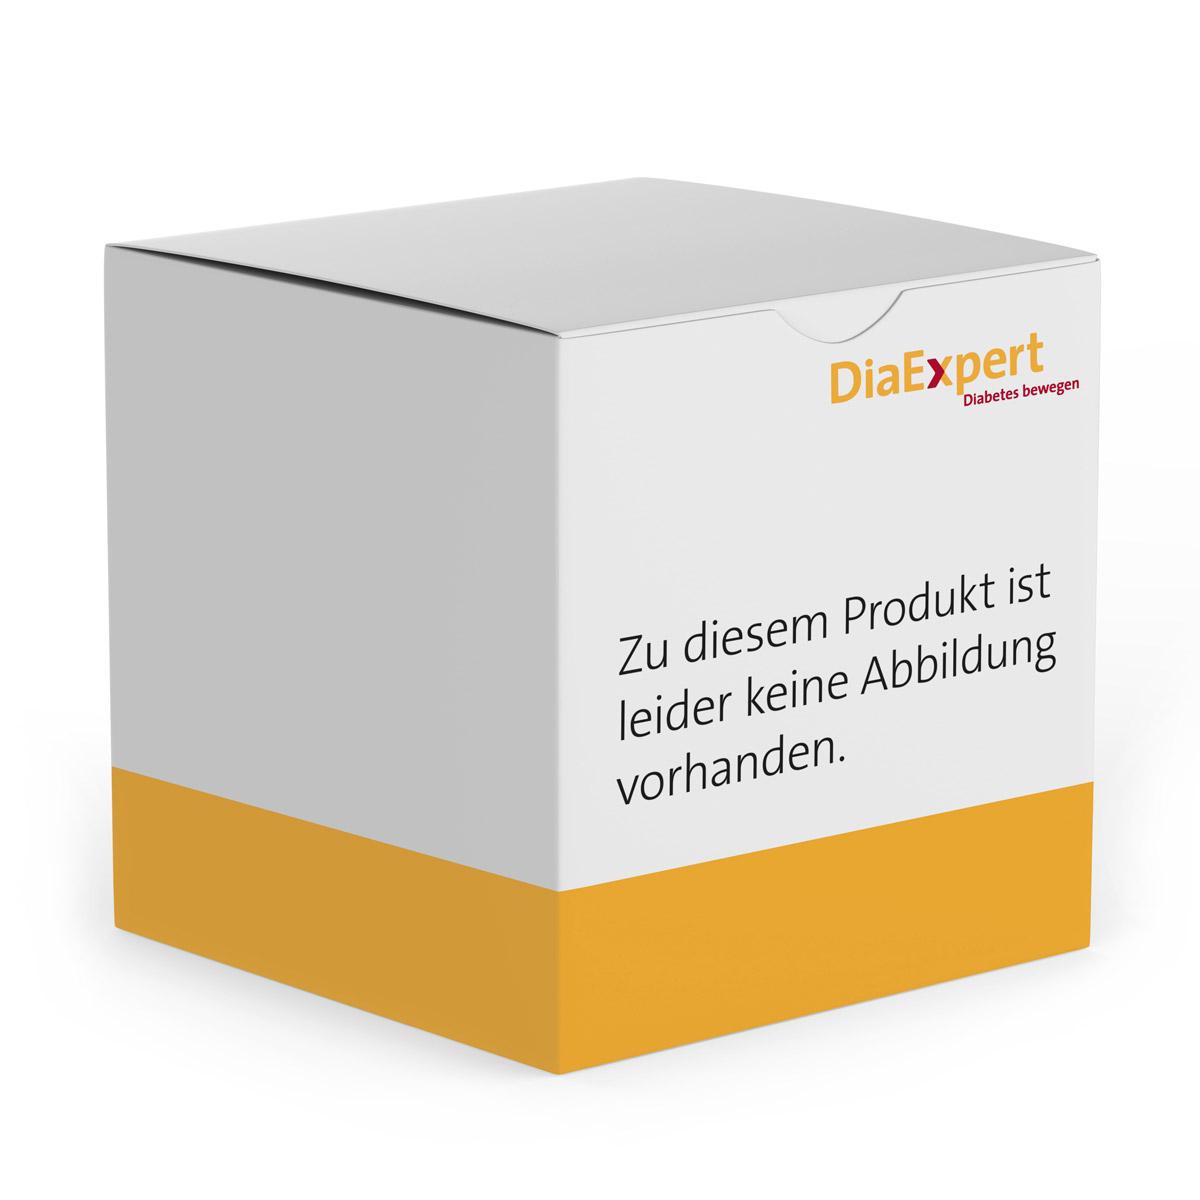 OneTouch Verio Flex Set mmol/L